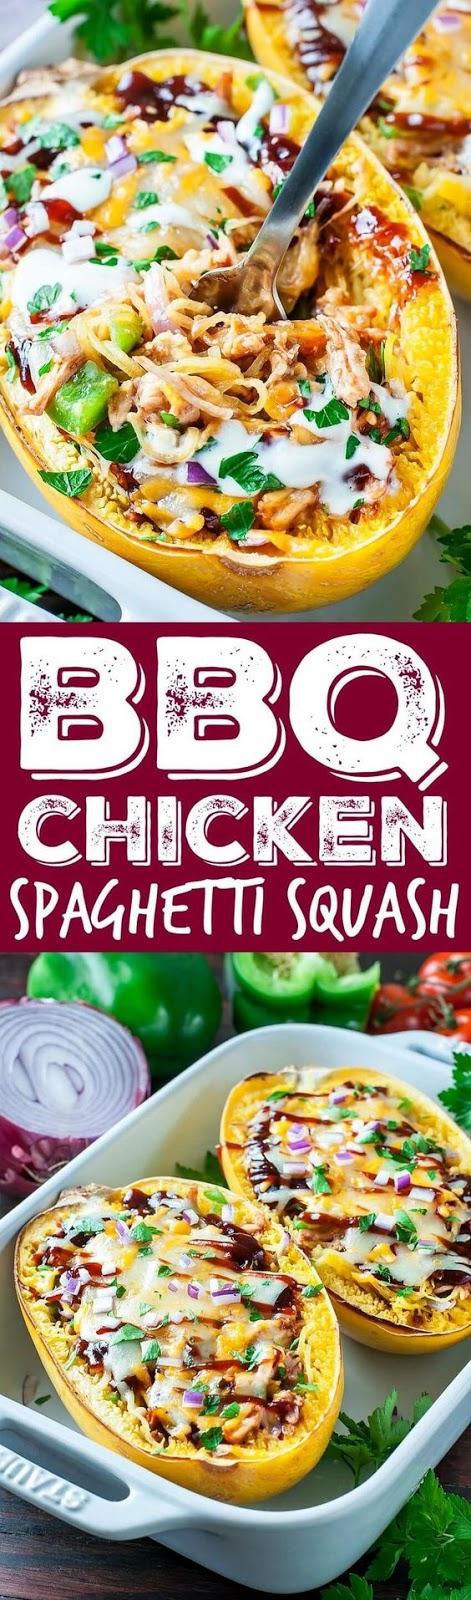 BBQ Chicken Spaghetti Squash